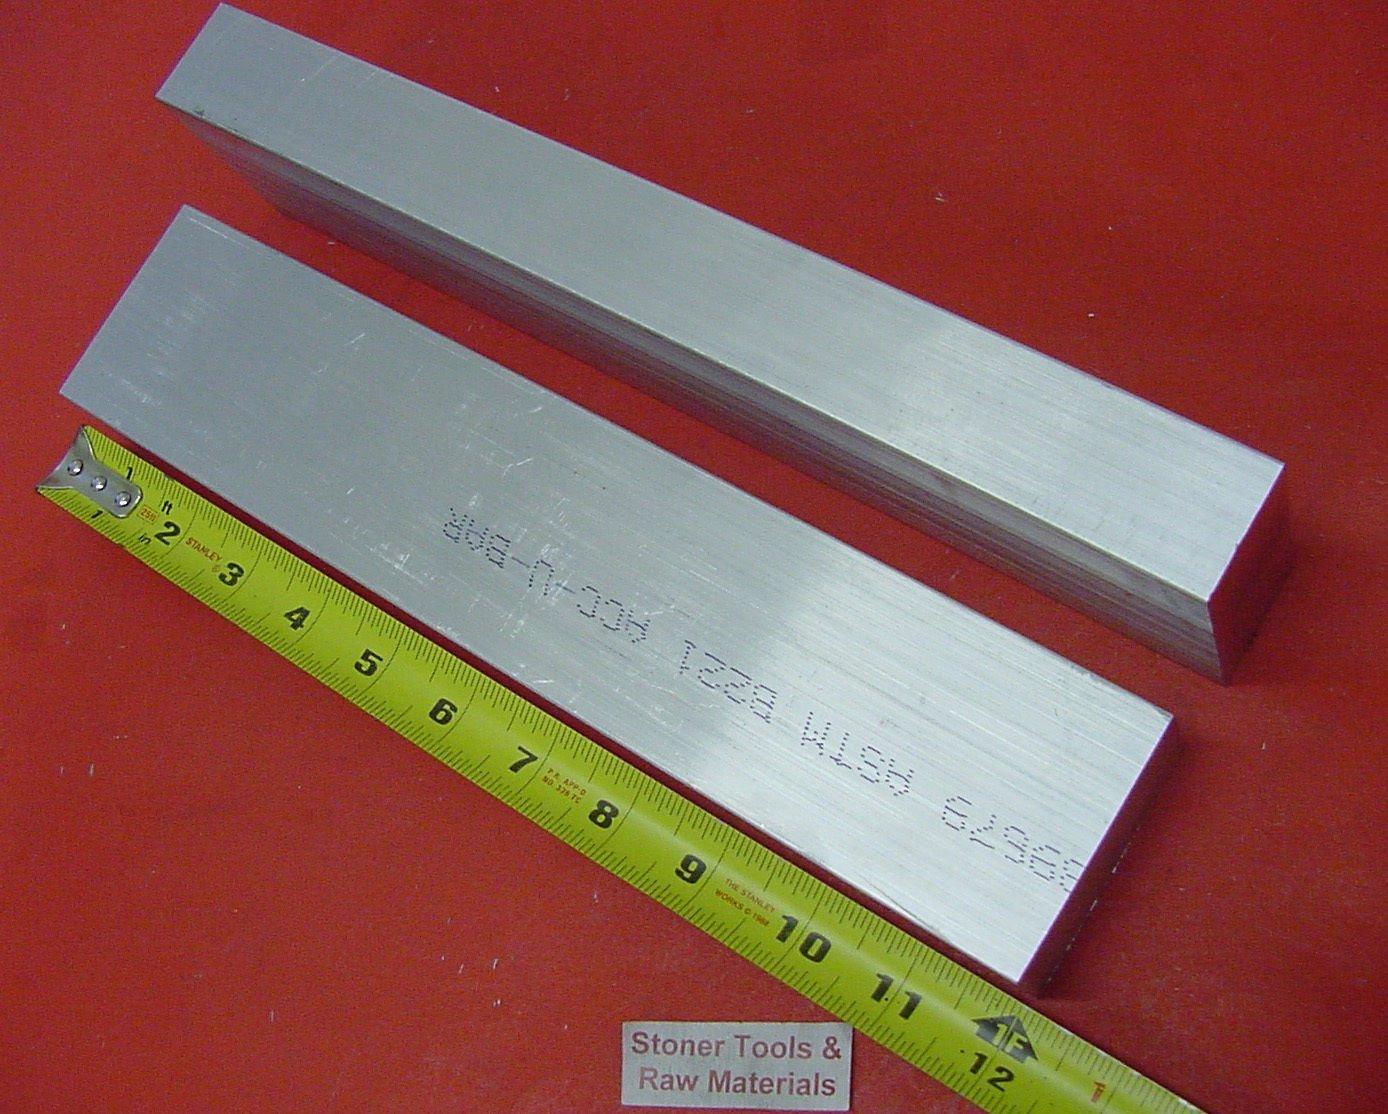 "2 Pieces 1-1/4"" X 2-1/2"" ALUMINUM 6061 FLAT BAR 12"" long Solid 1.250"" Mill Stock"